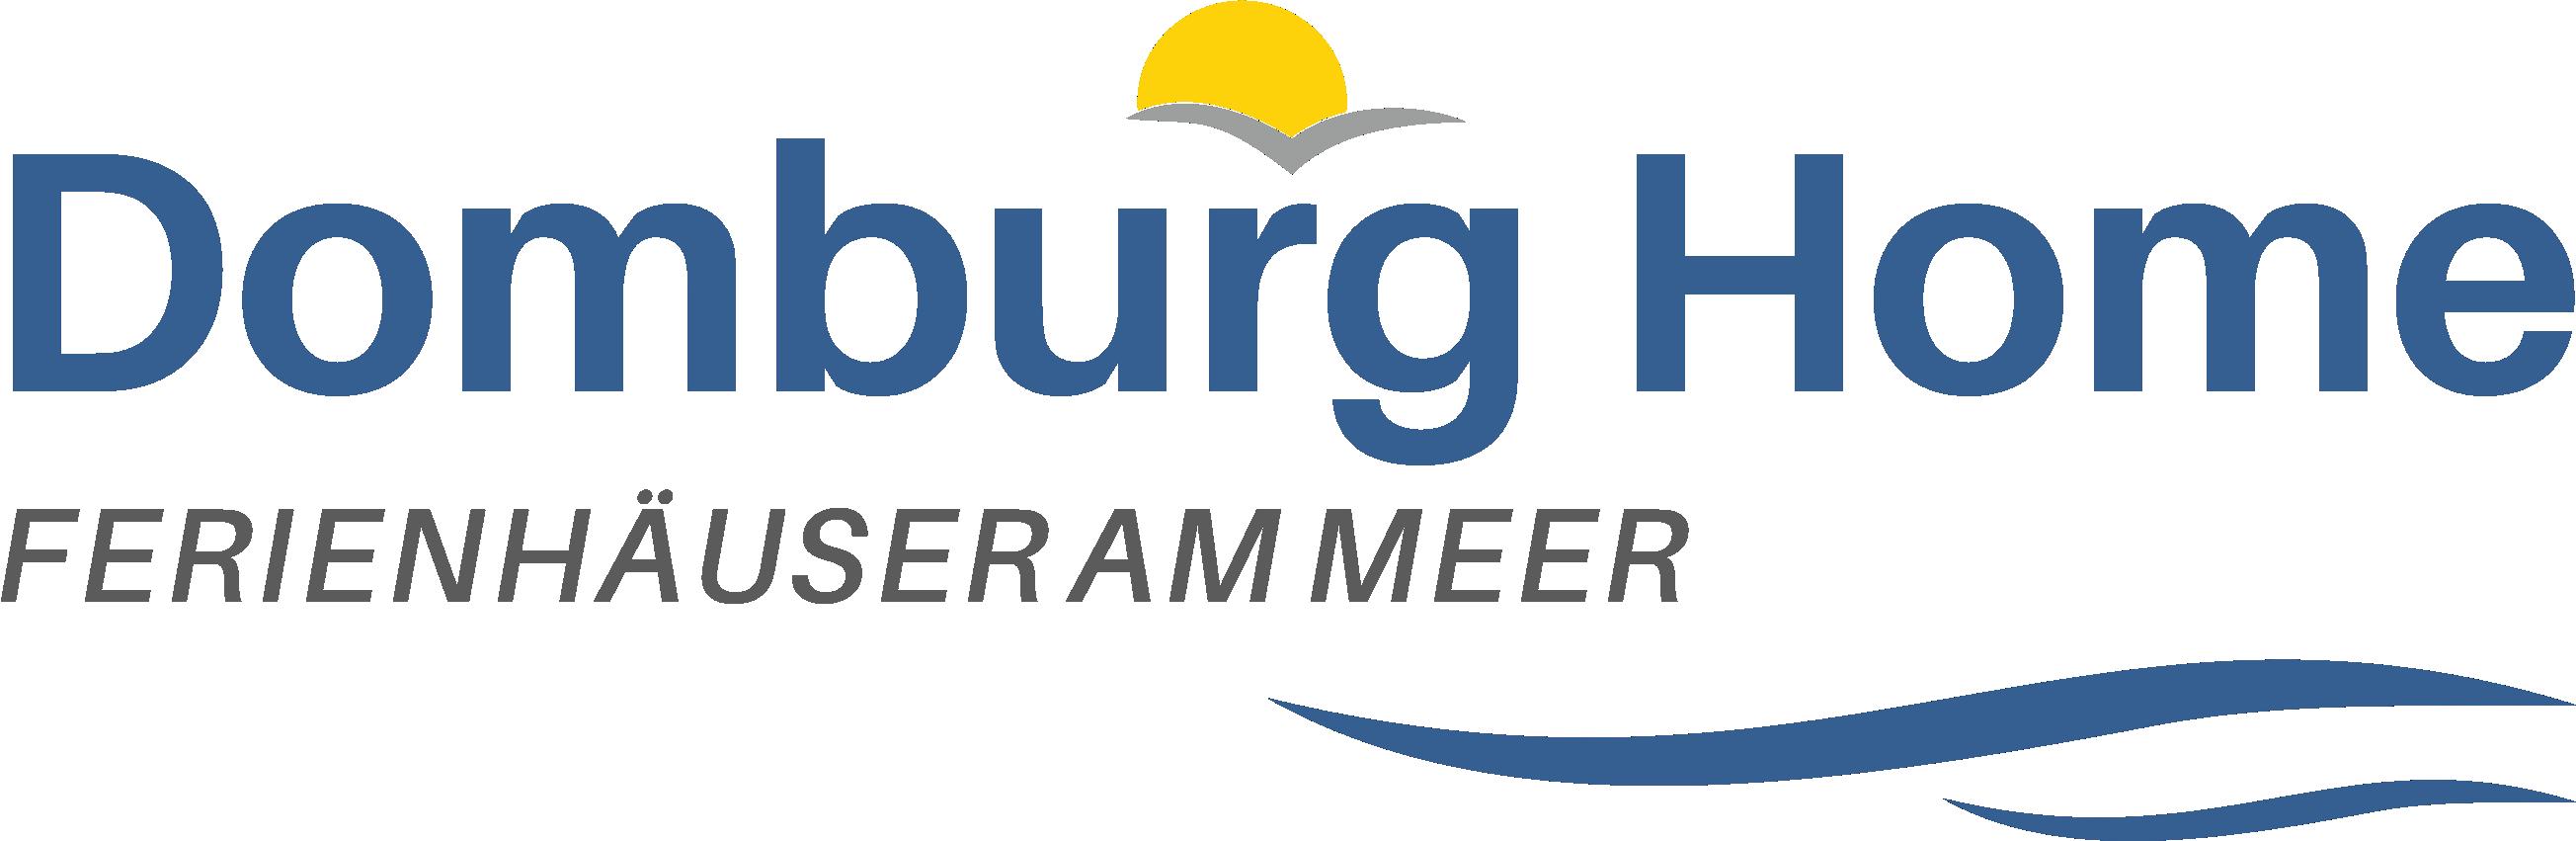 Domburghome.com